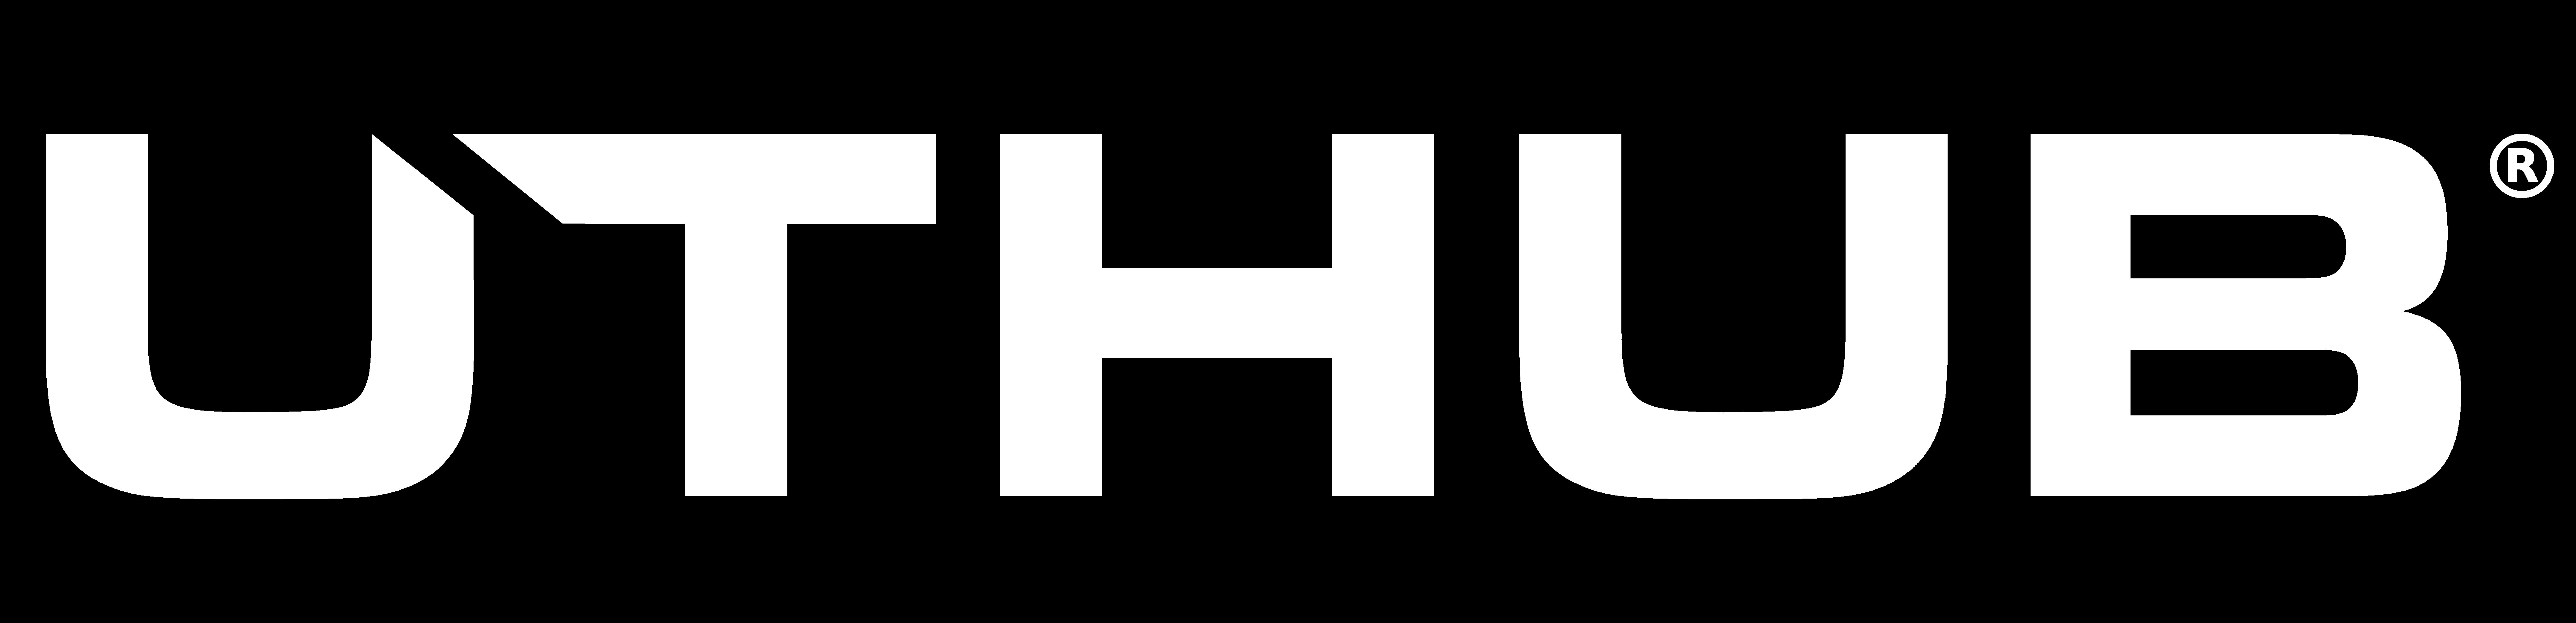 cropped-UTHUB_LOGO_INVERT-1.png